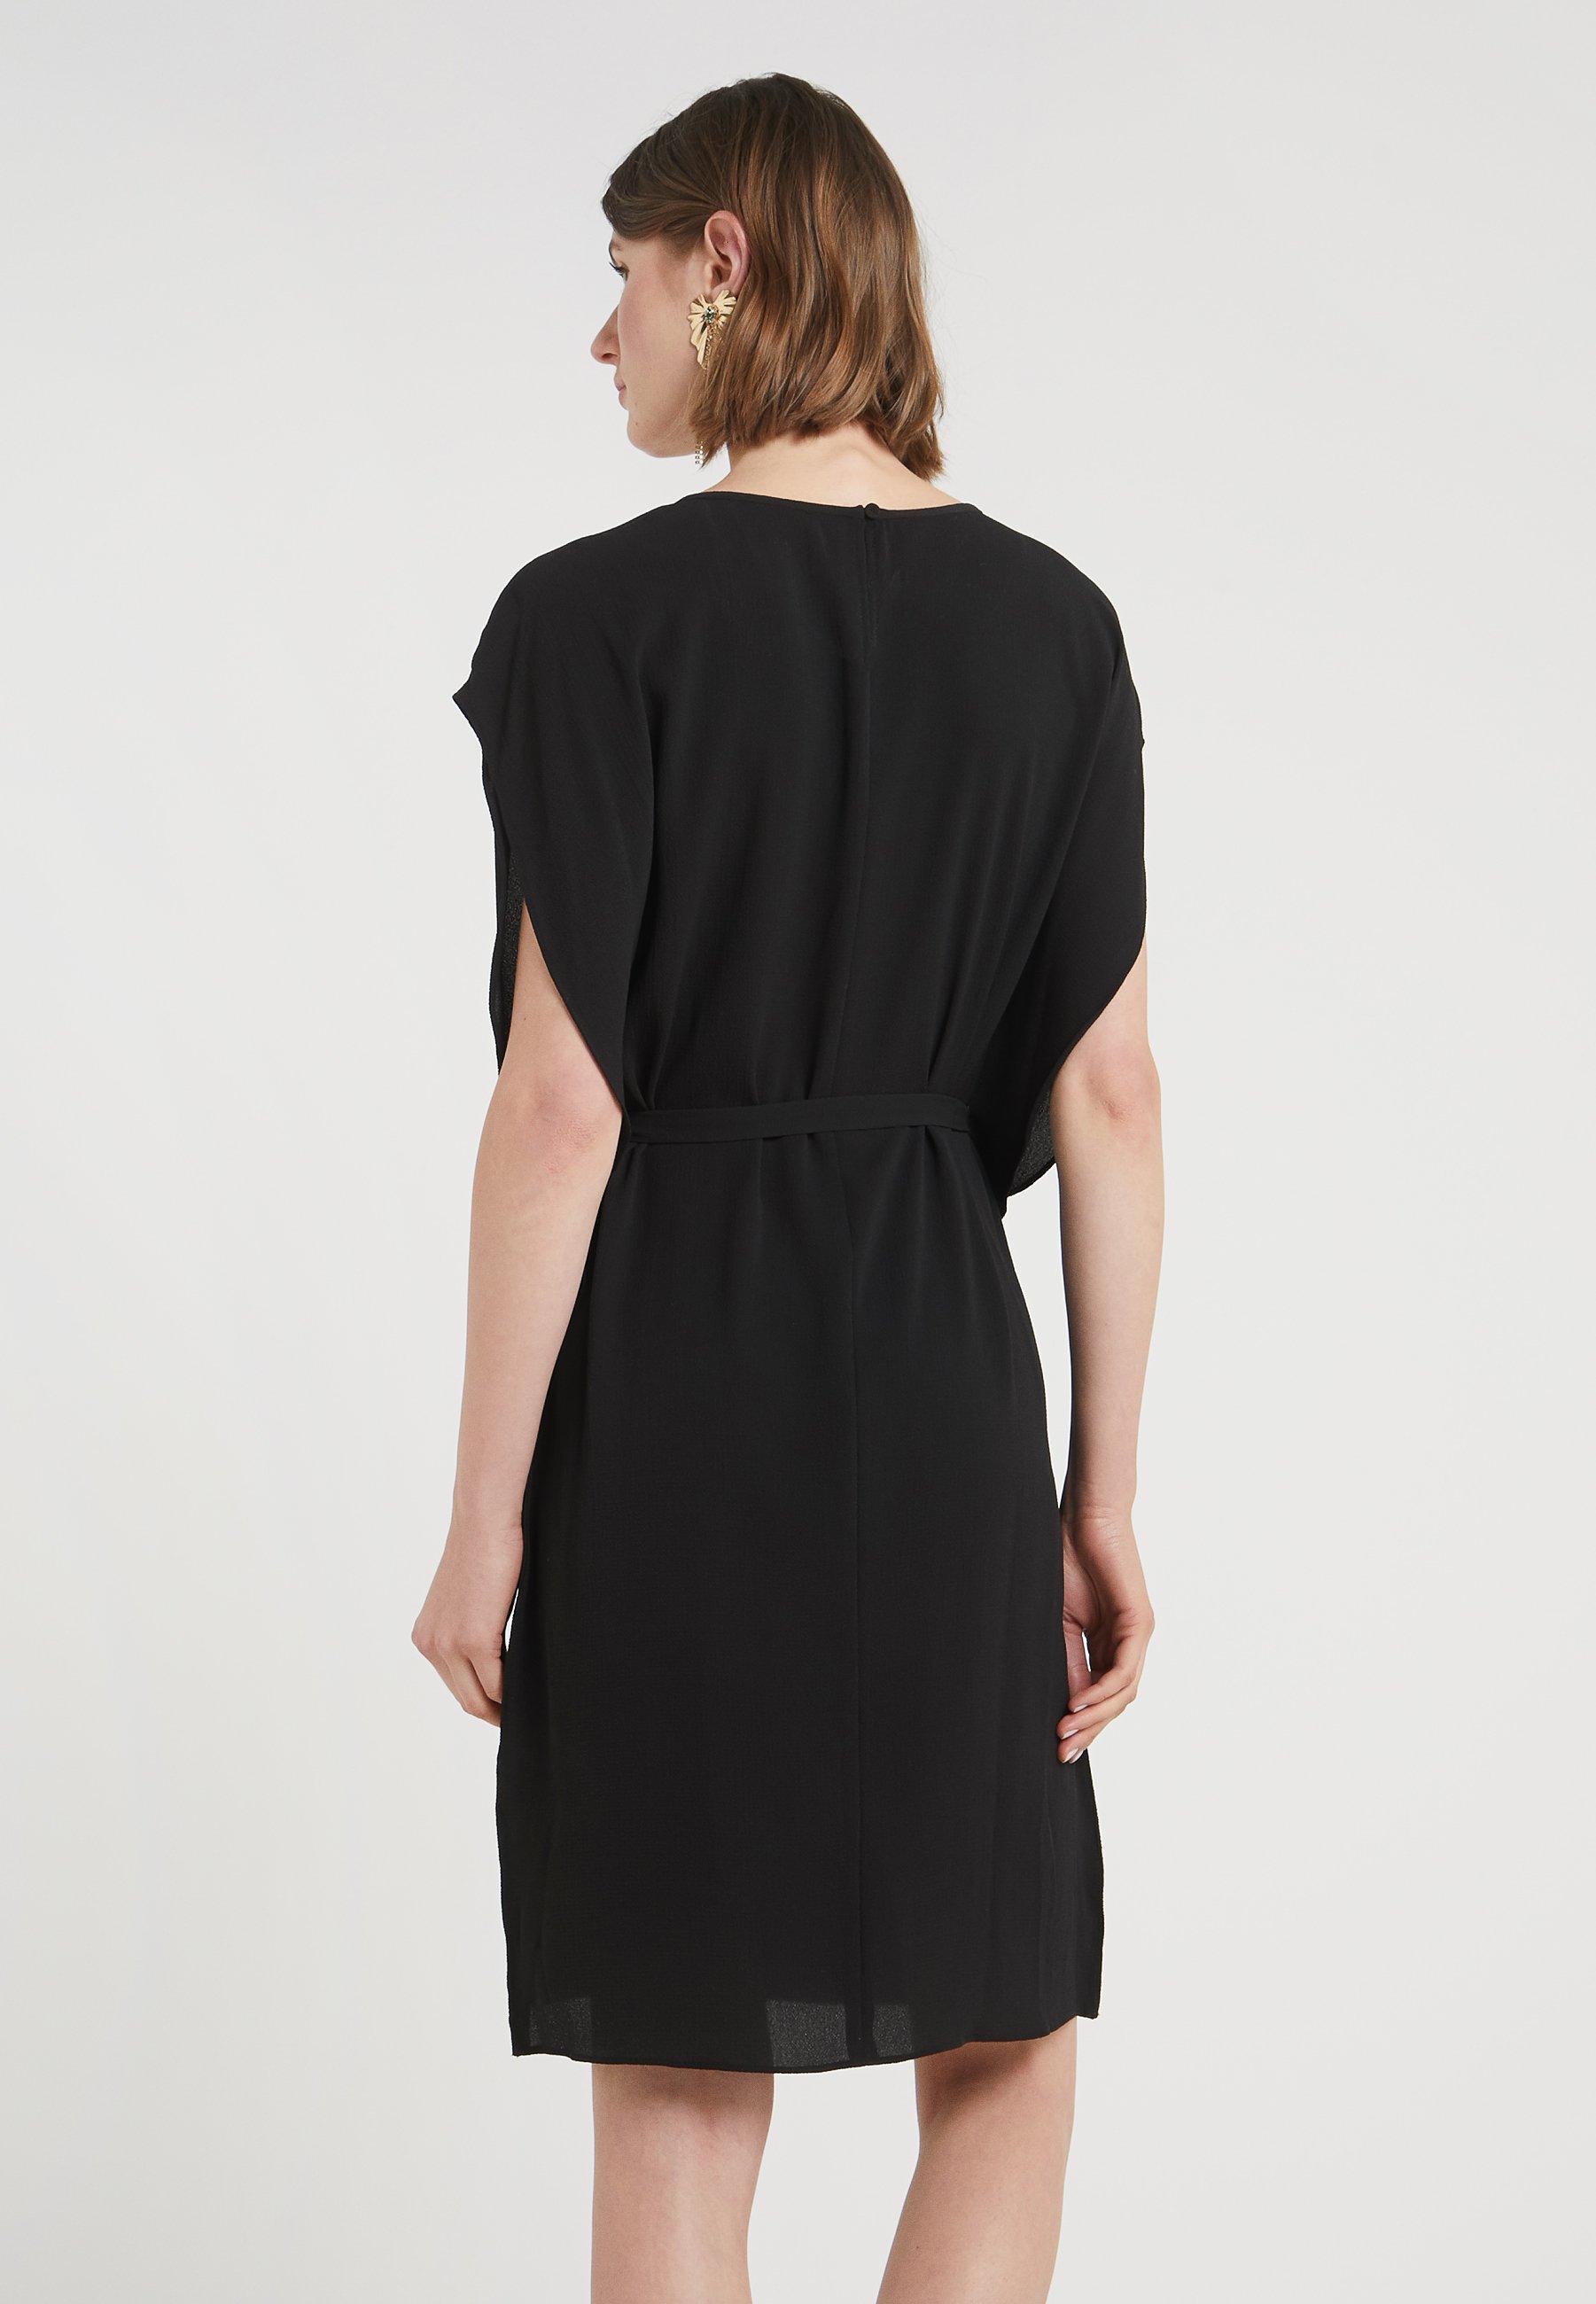 Frea D'été Bazaar Black Bruuns DressRobe Ines QrdCtshx